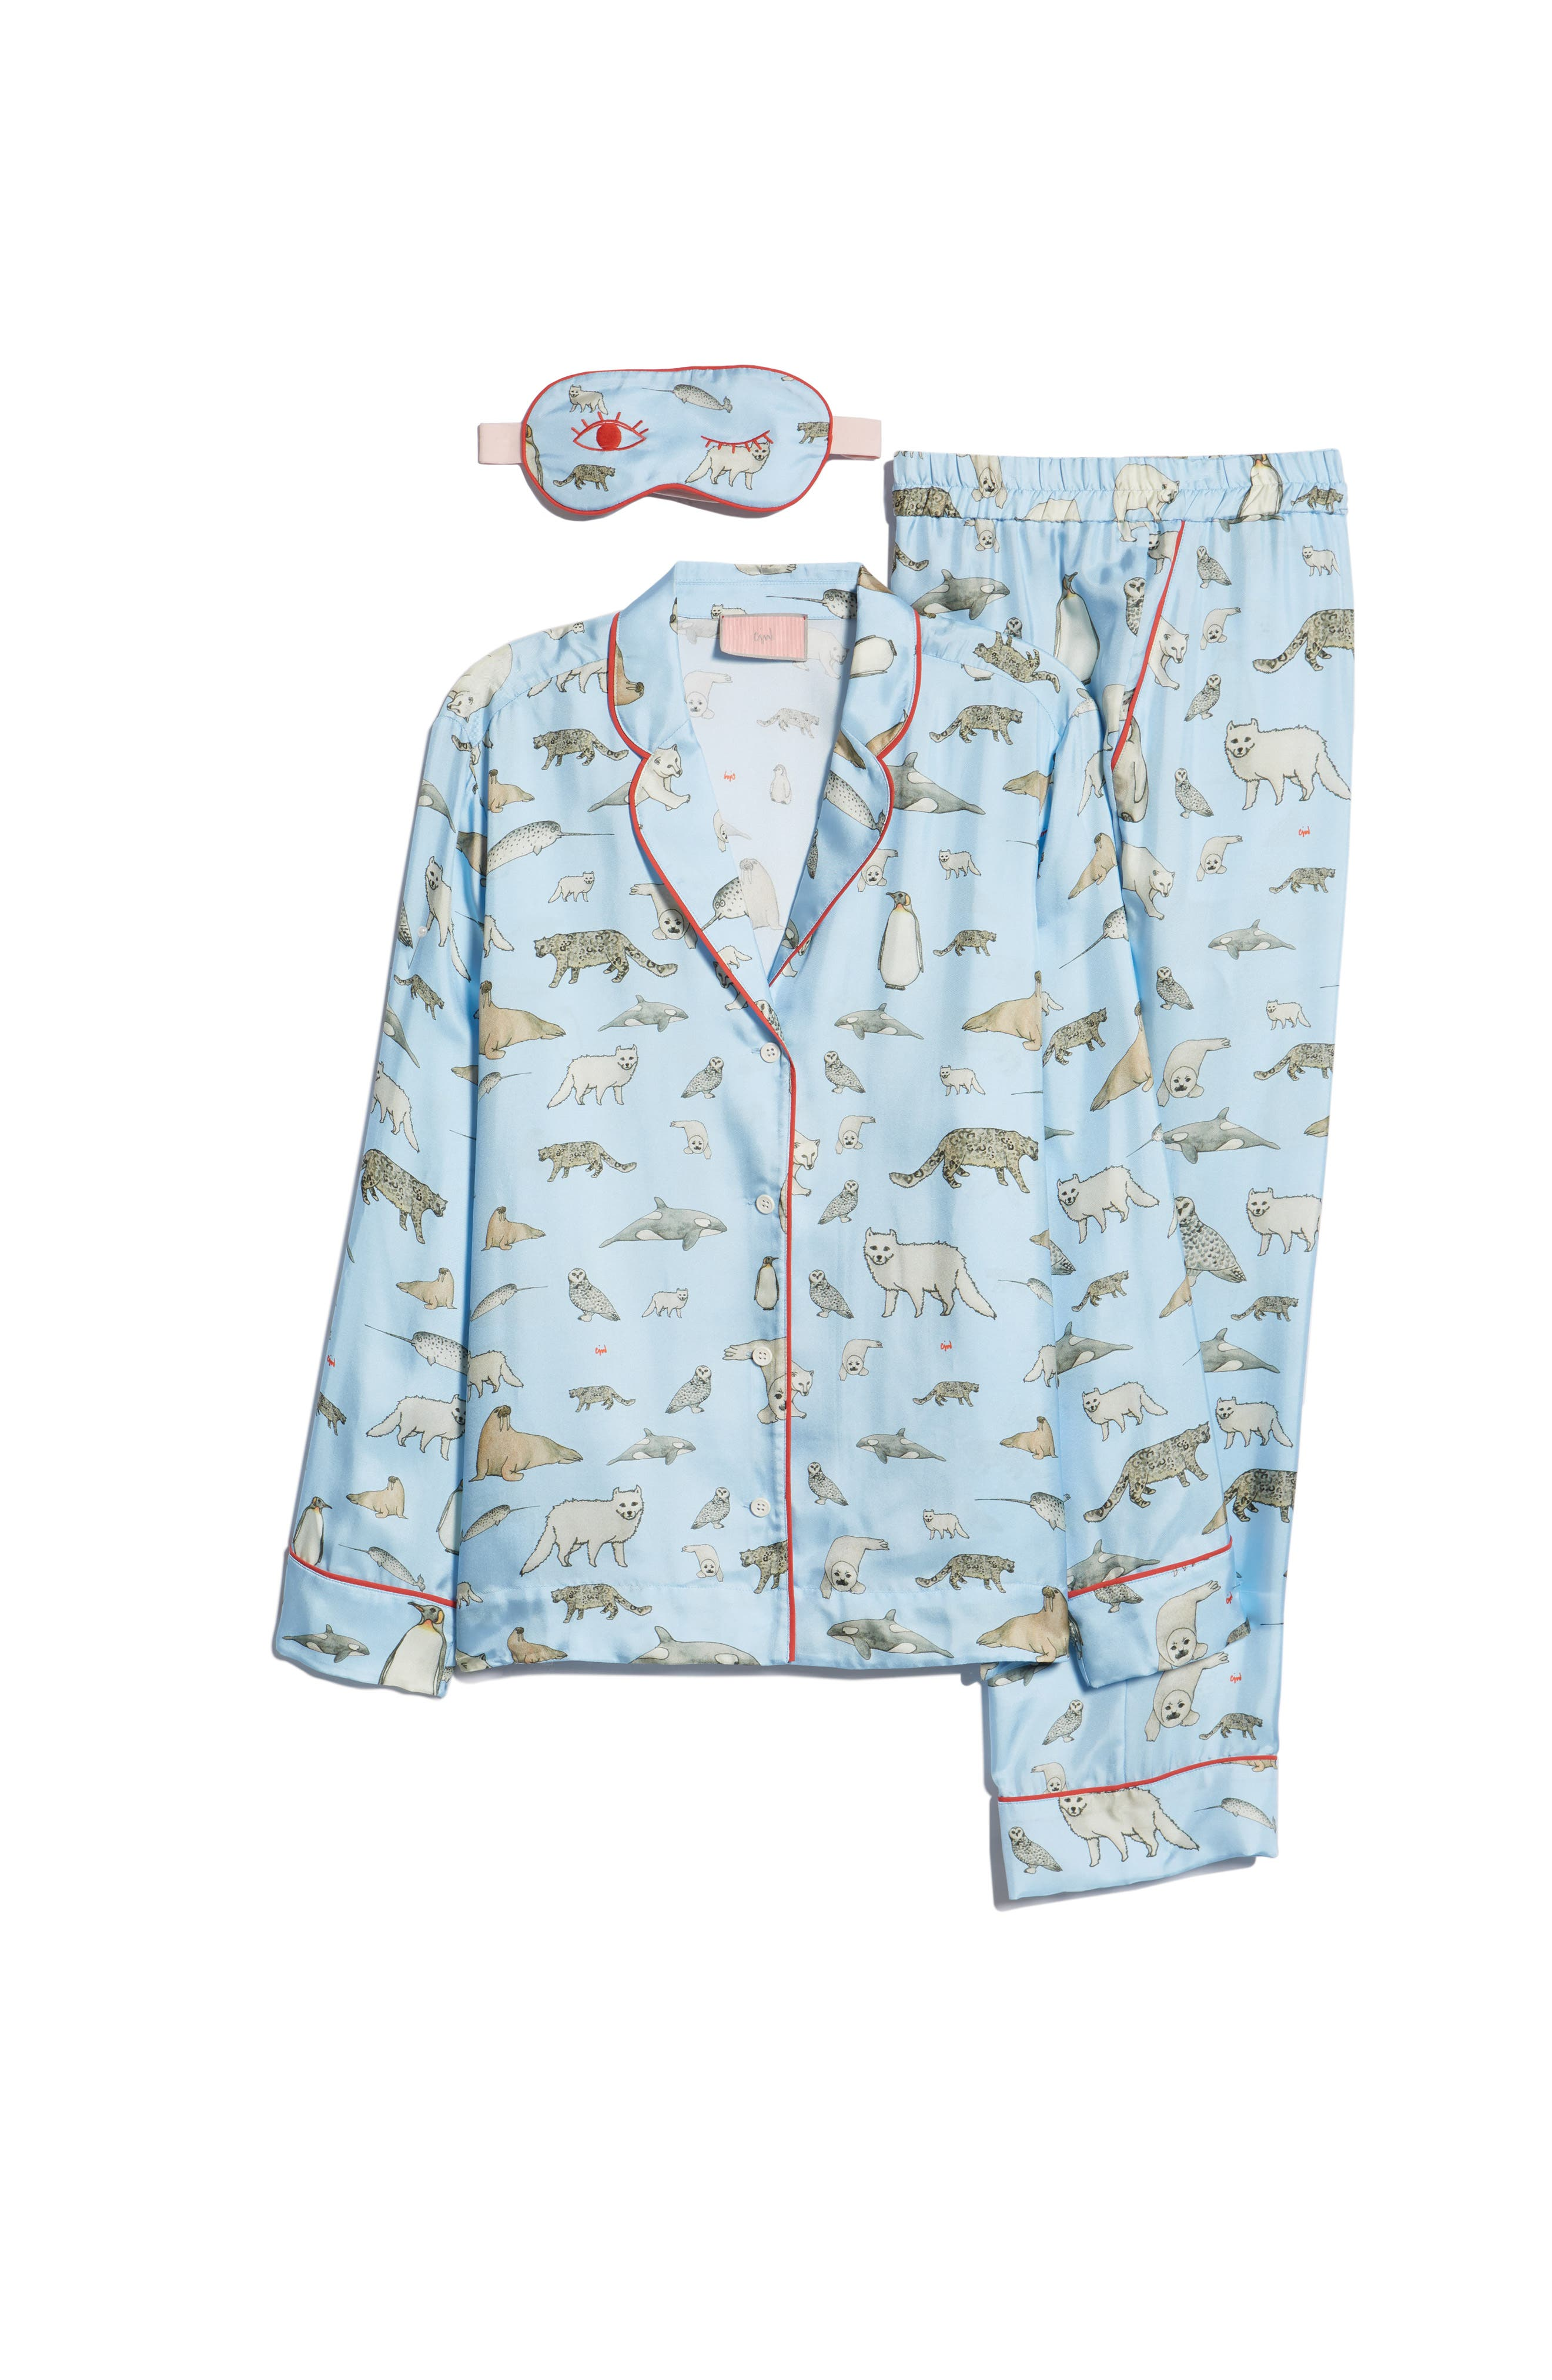 Winter Animals Pajamas & Eye Mask,                             Alternate thumbnail 7, color,                             LIGHT BLUE